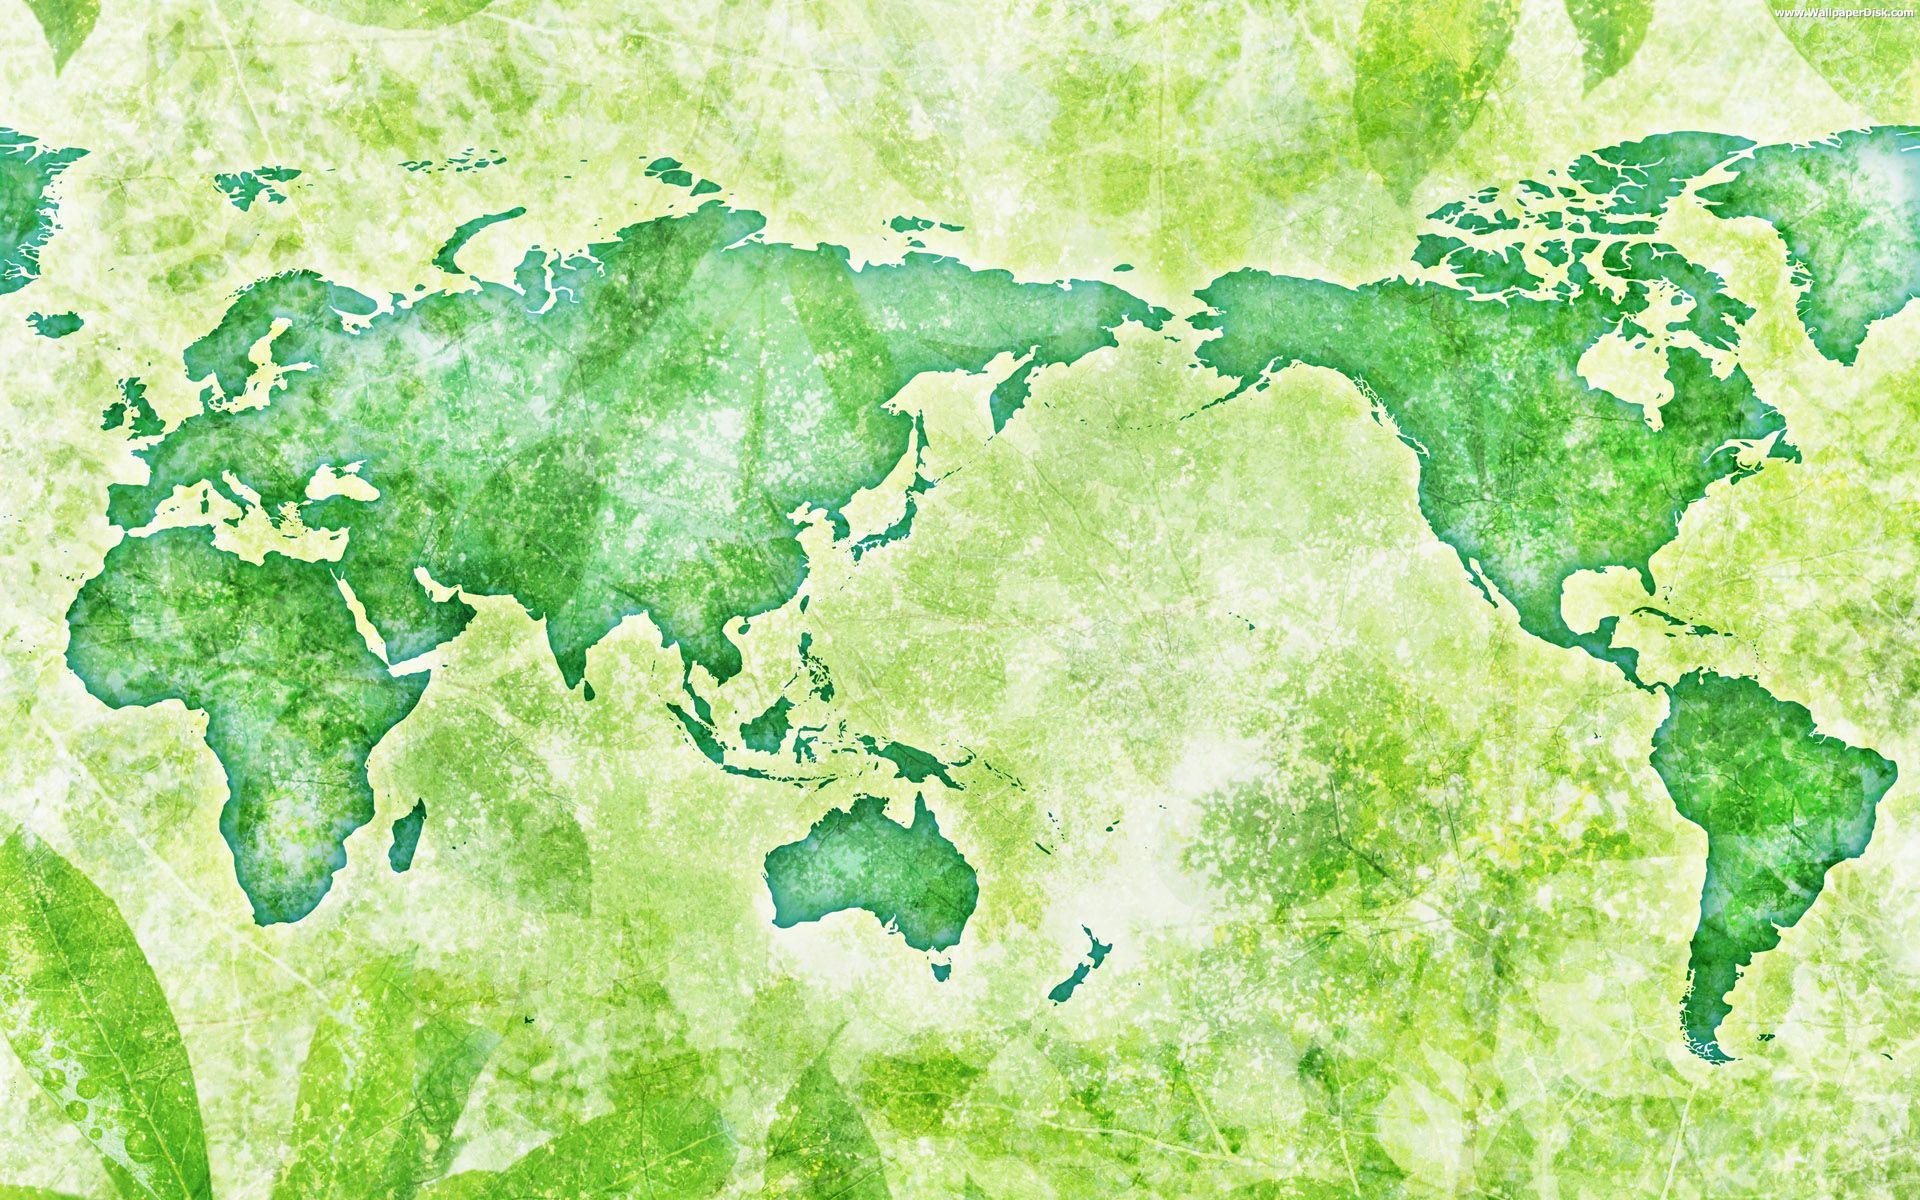 World Map Wallpaper Map Wallpapers Backgrounds Home Design Ideas 1920x1200